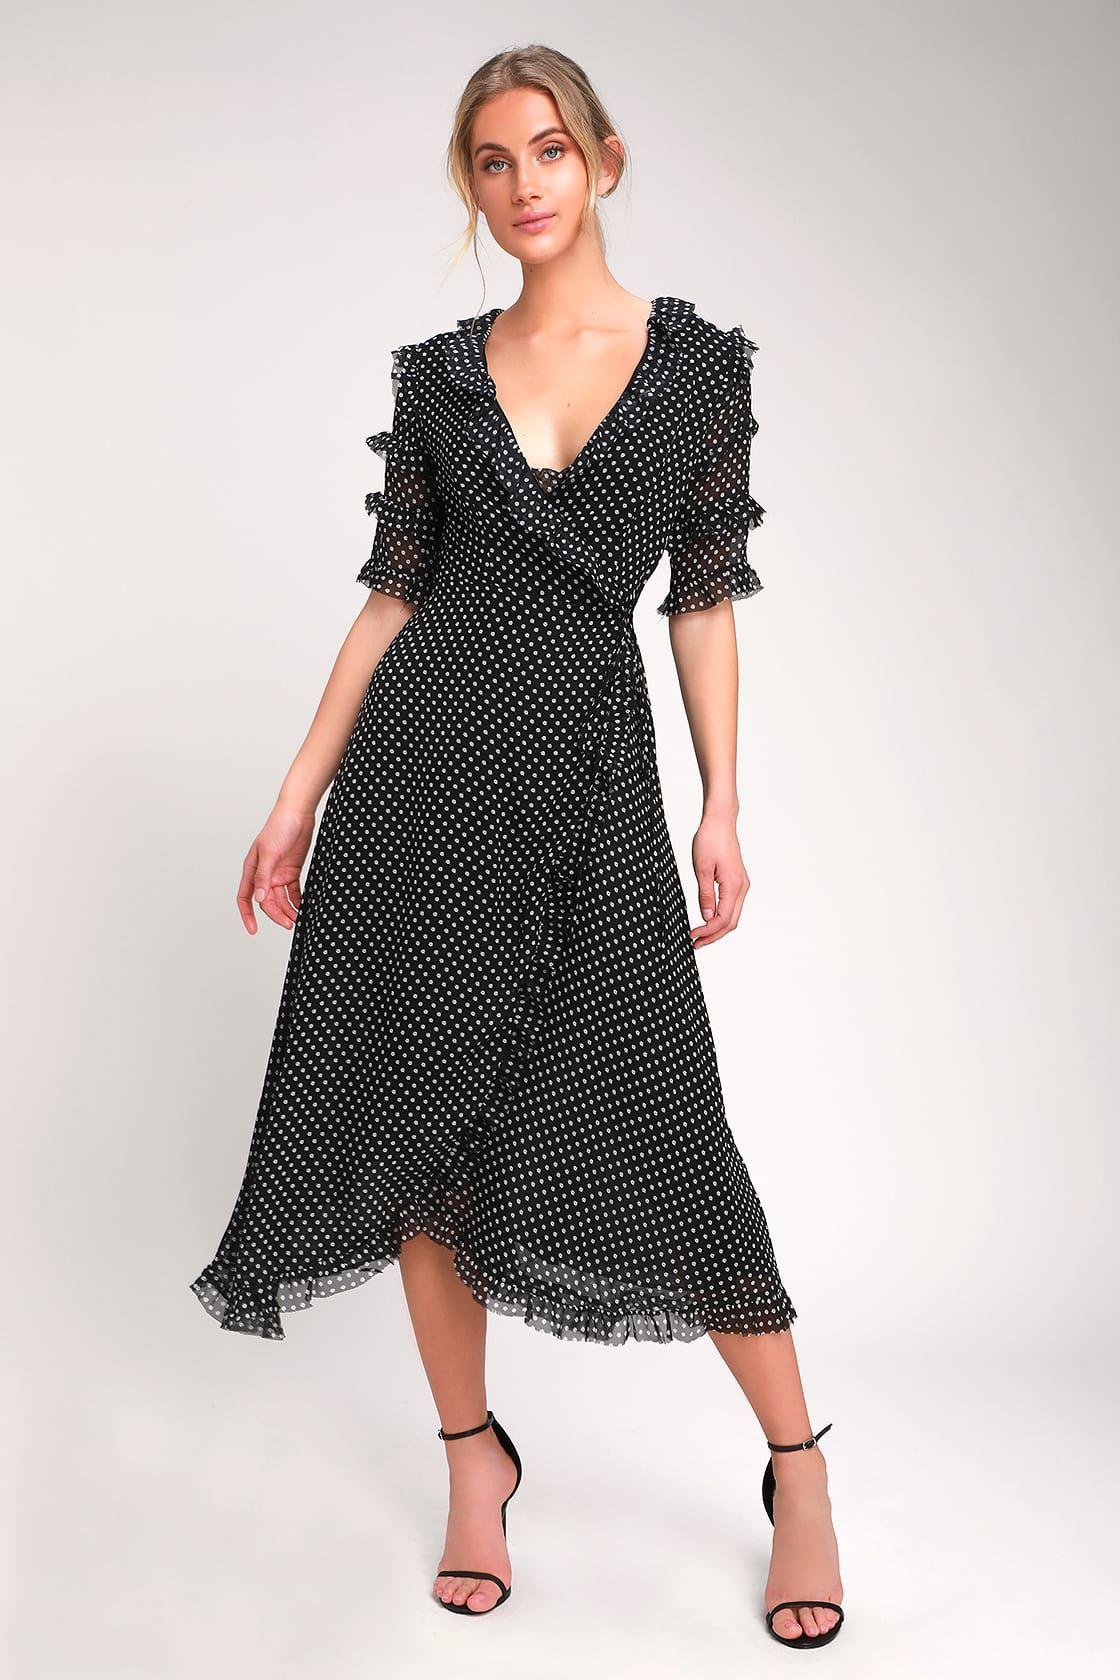 ddefd7b9a00f City View Black Floral Print Ruffled Wrap Midi Dress in 2019 ...